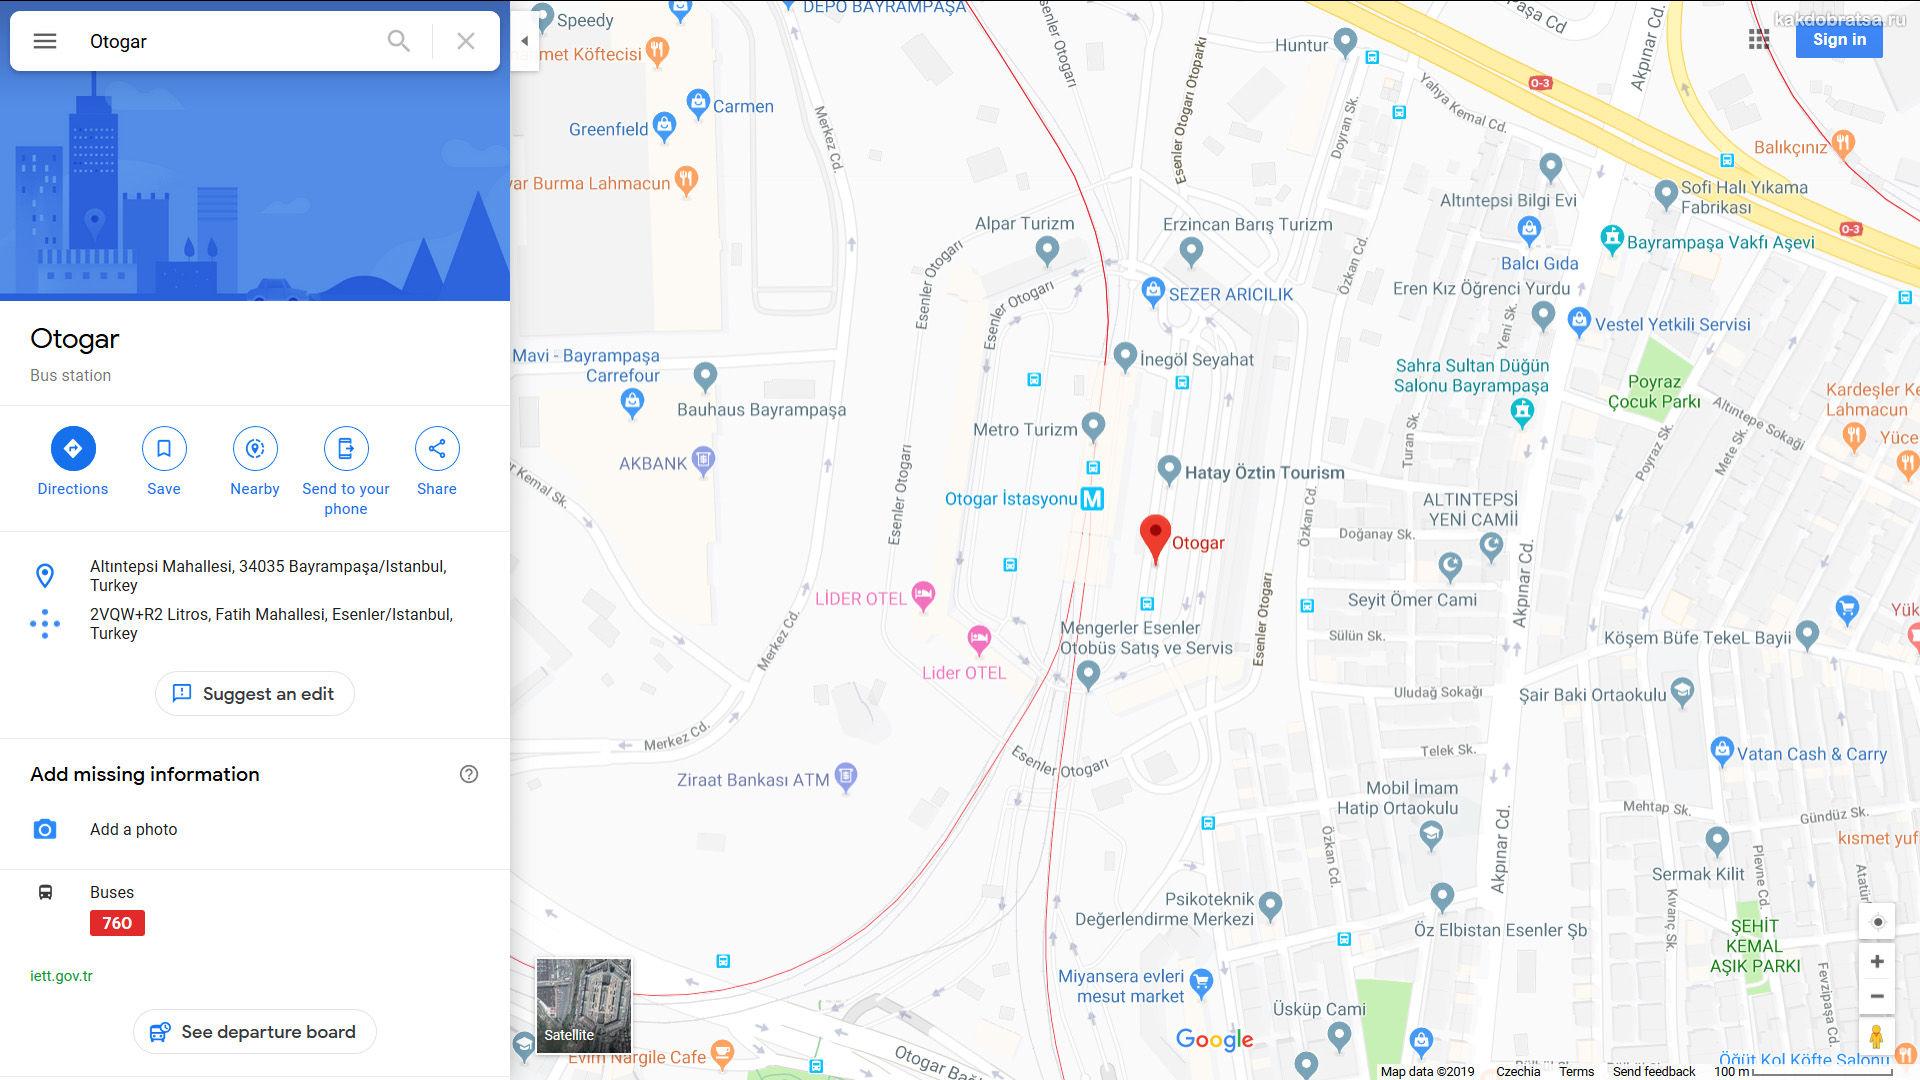 Центральный Автовокзал Стамбула Байрампаша на карте